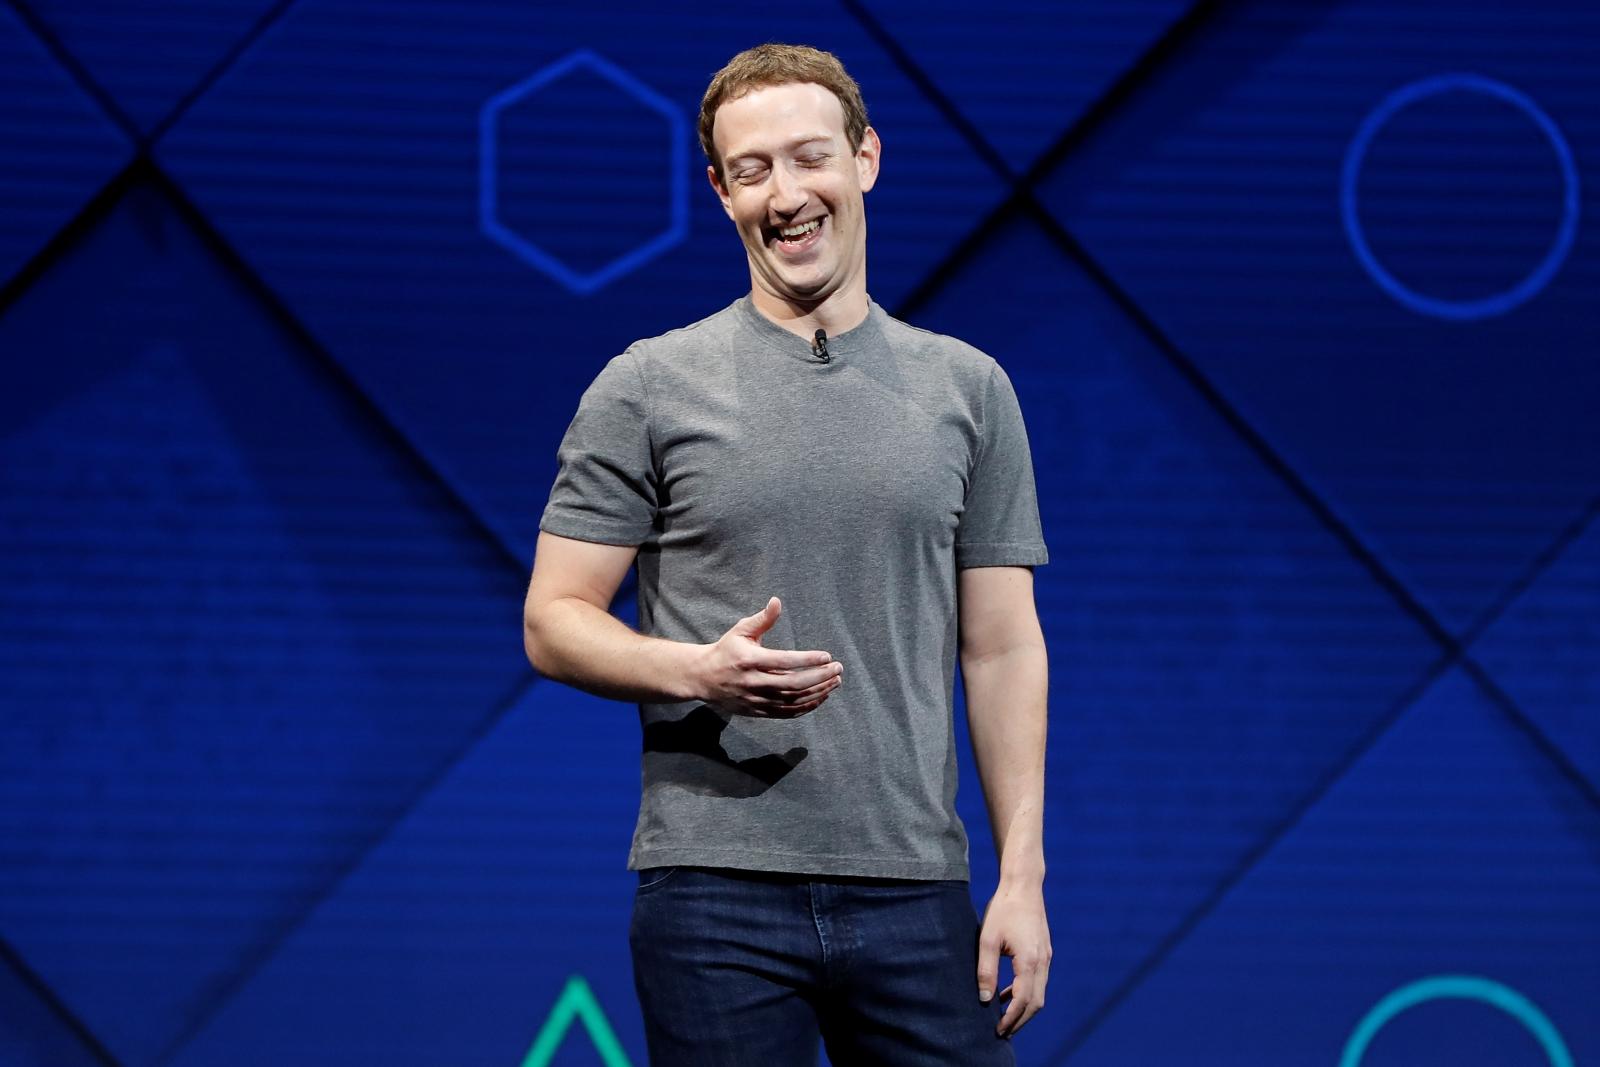 zuckerberg grey t shirt